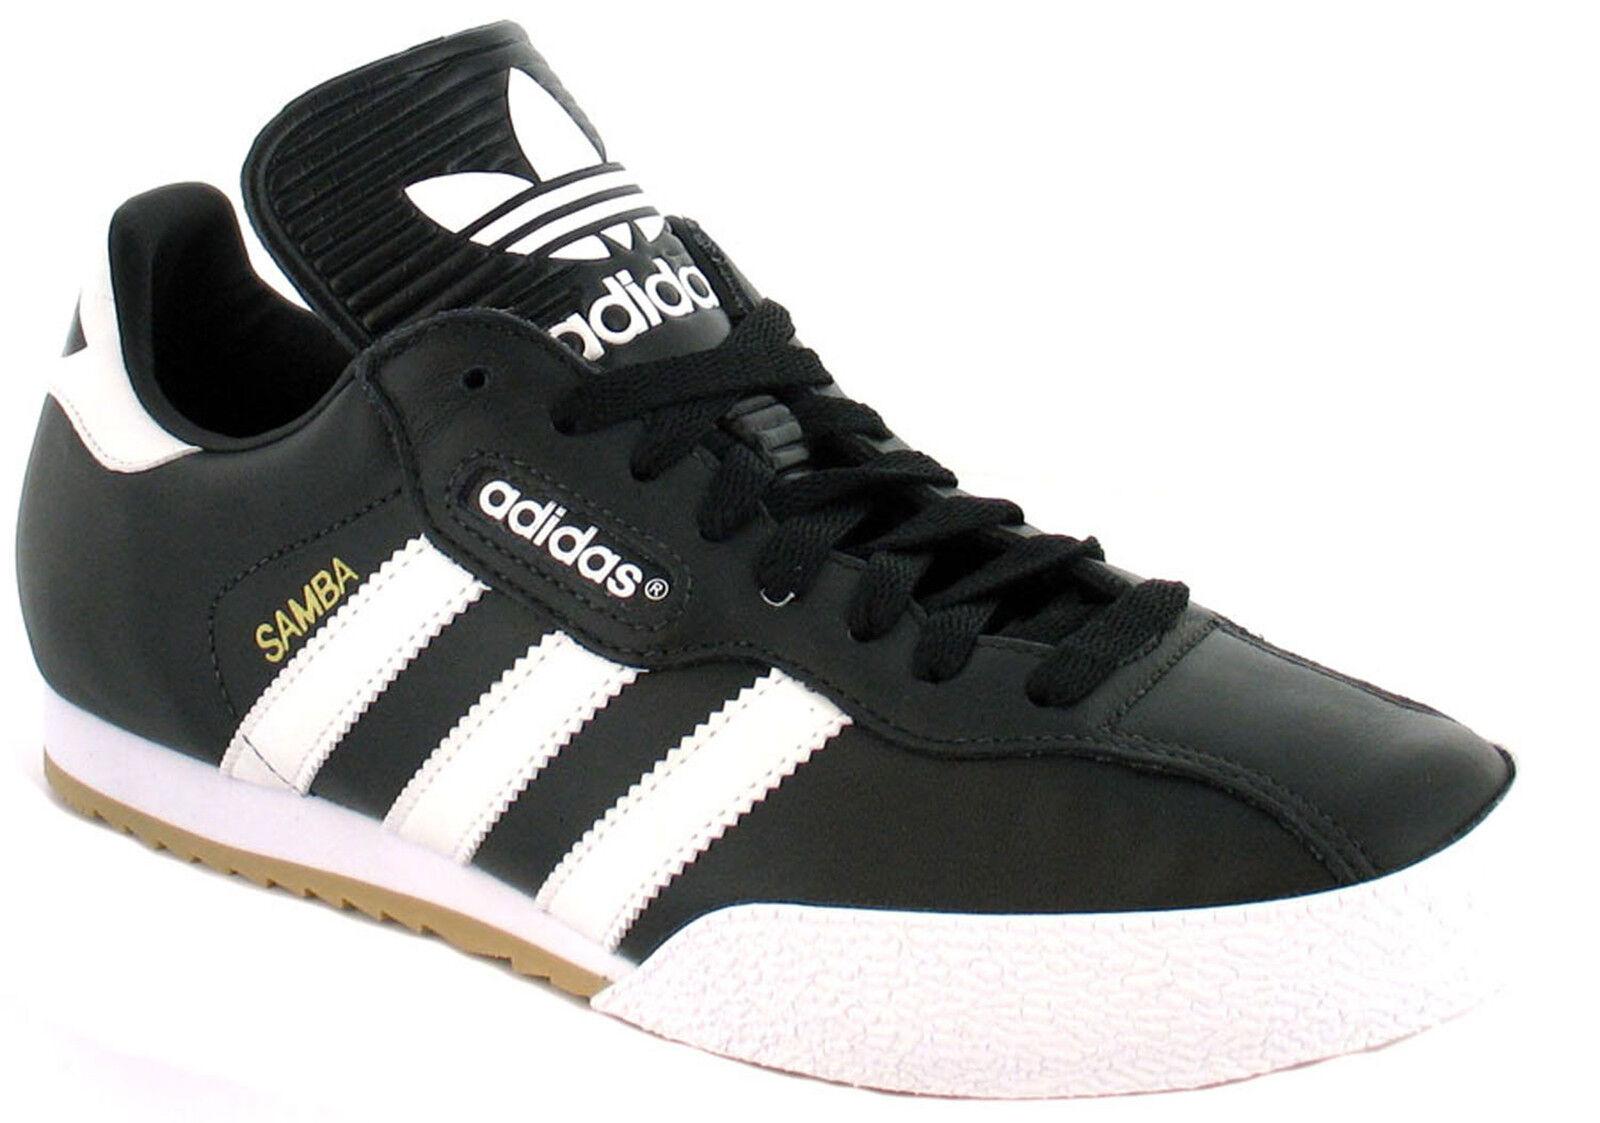 New Adidas Samba Super hommes Original Noir Leather Trainers UK